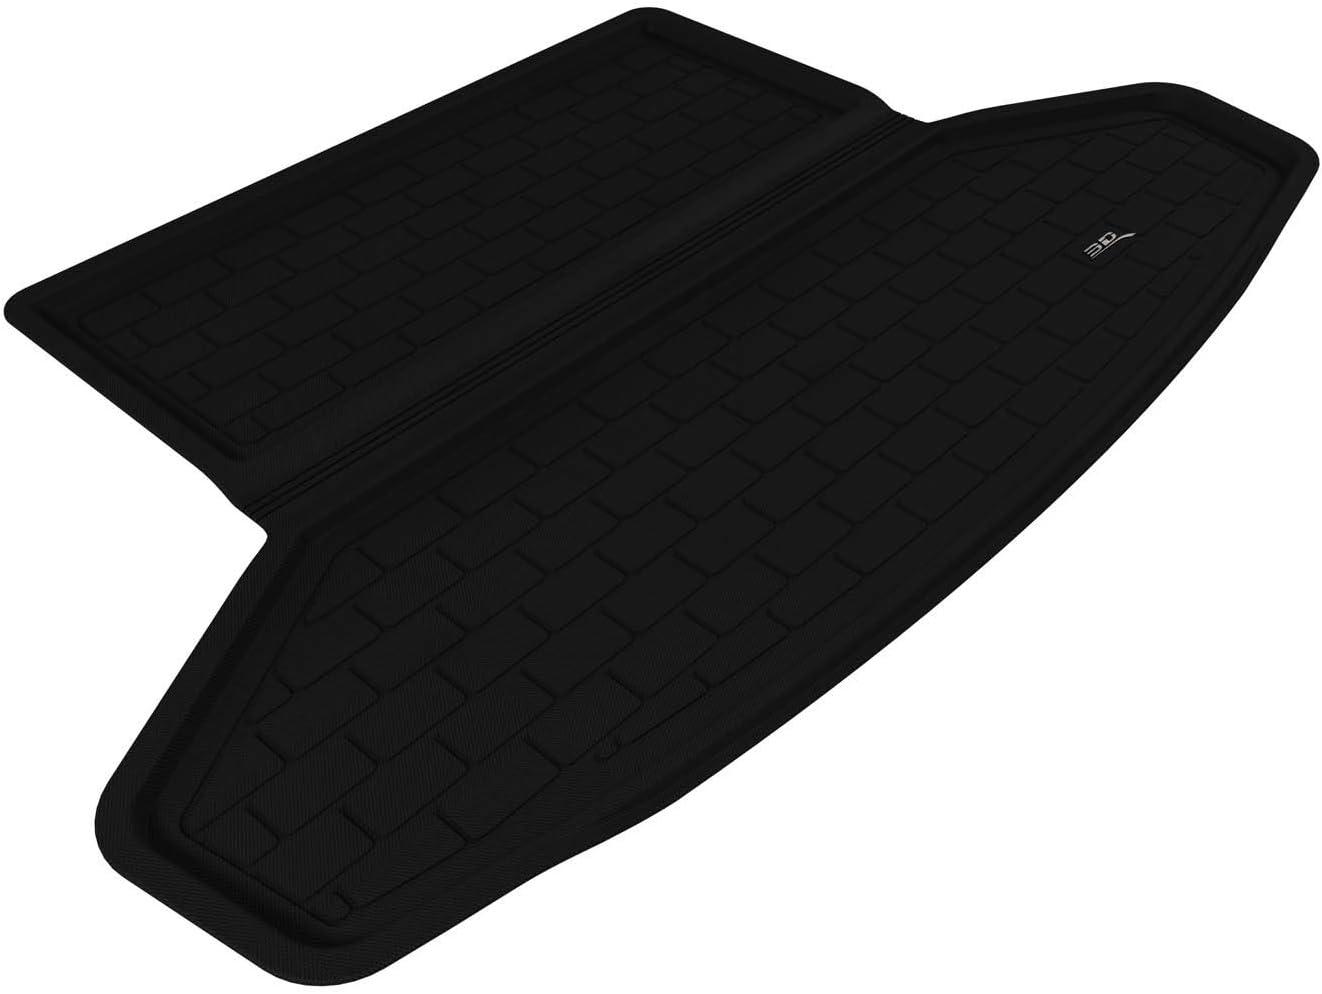 Kagu Rubber Black 3D MAXpider Custom Fit All-Weather Complete Set Floor Mat for Select Toyota RAV4 Models